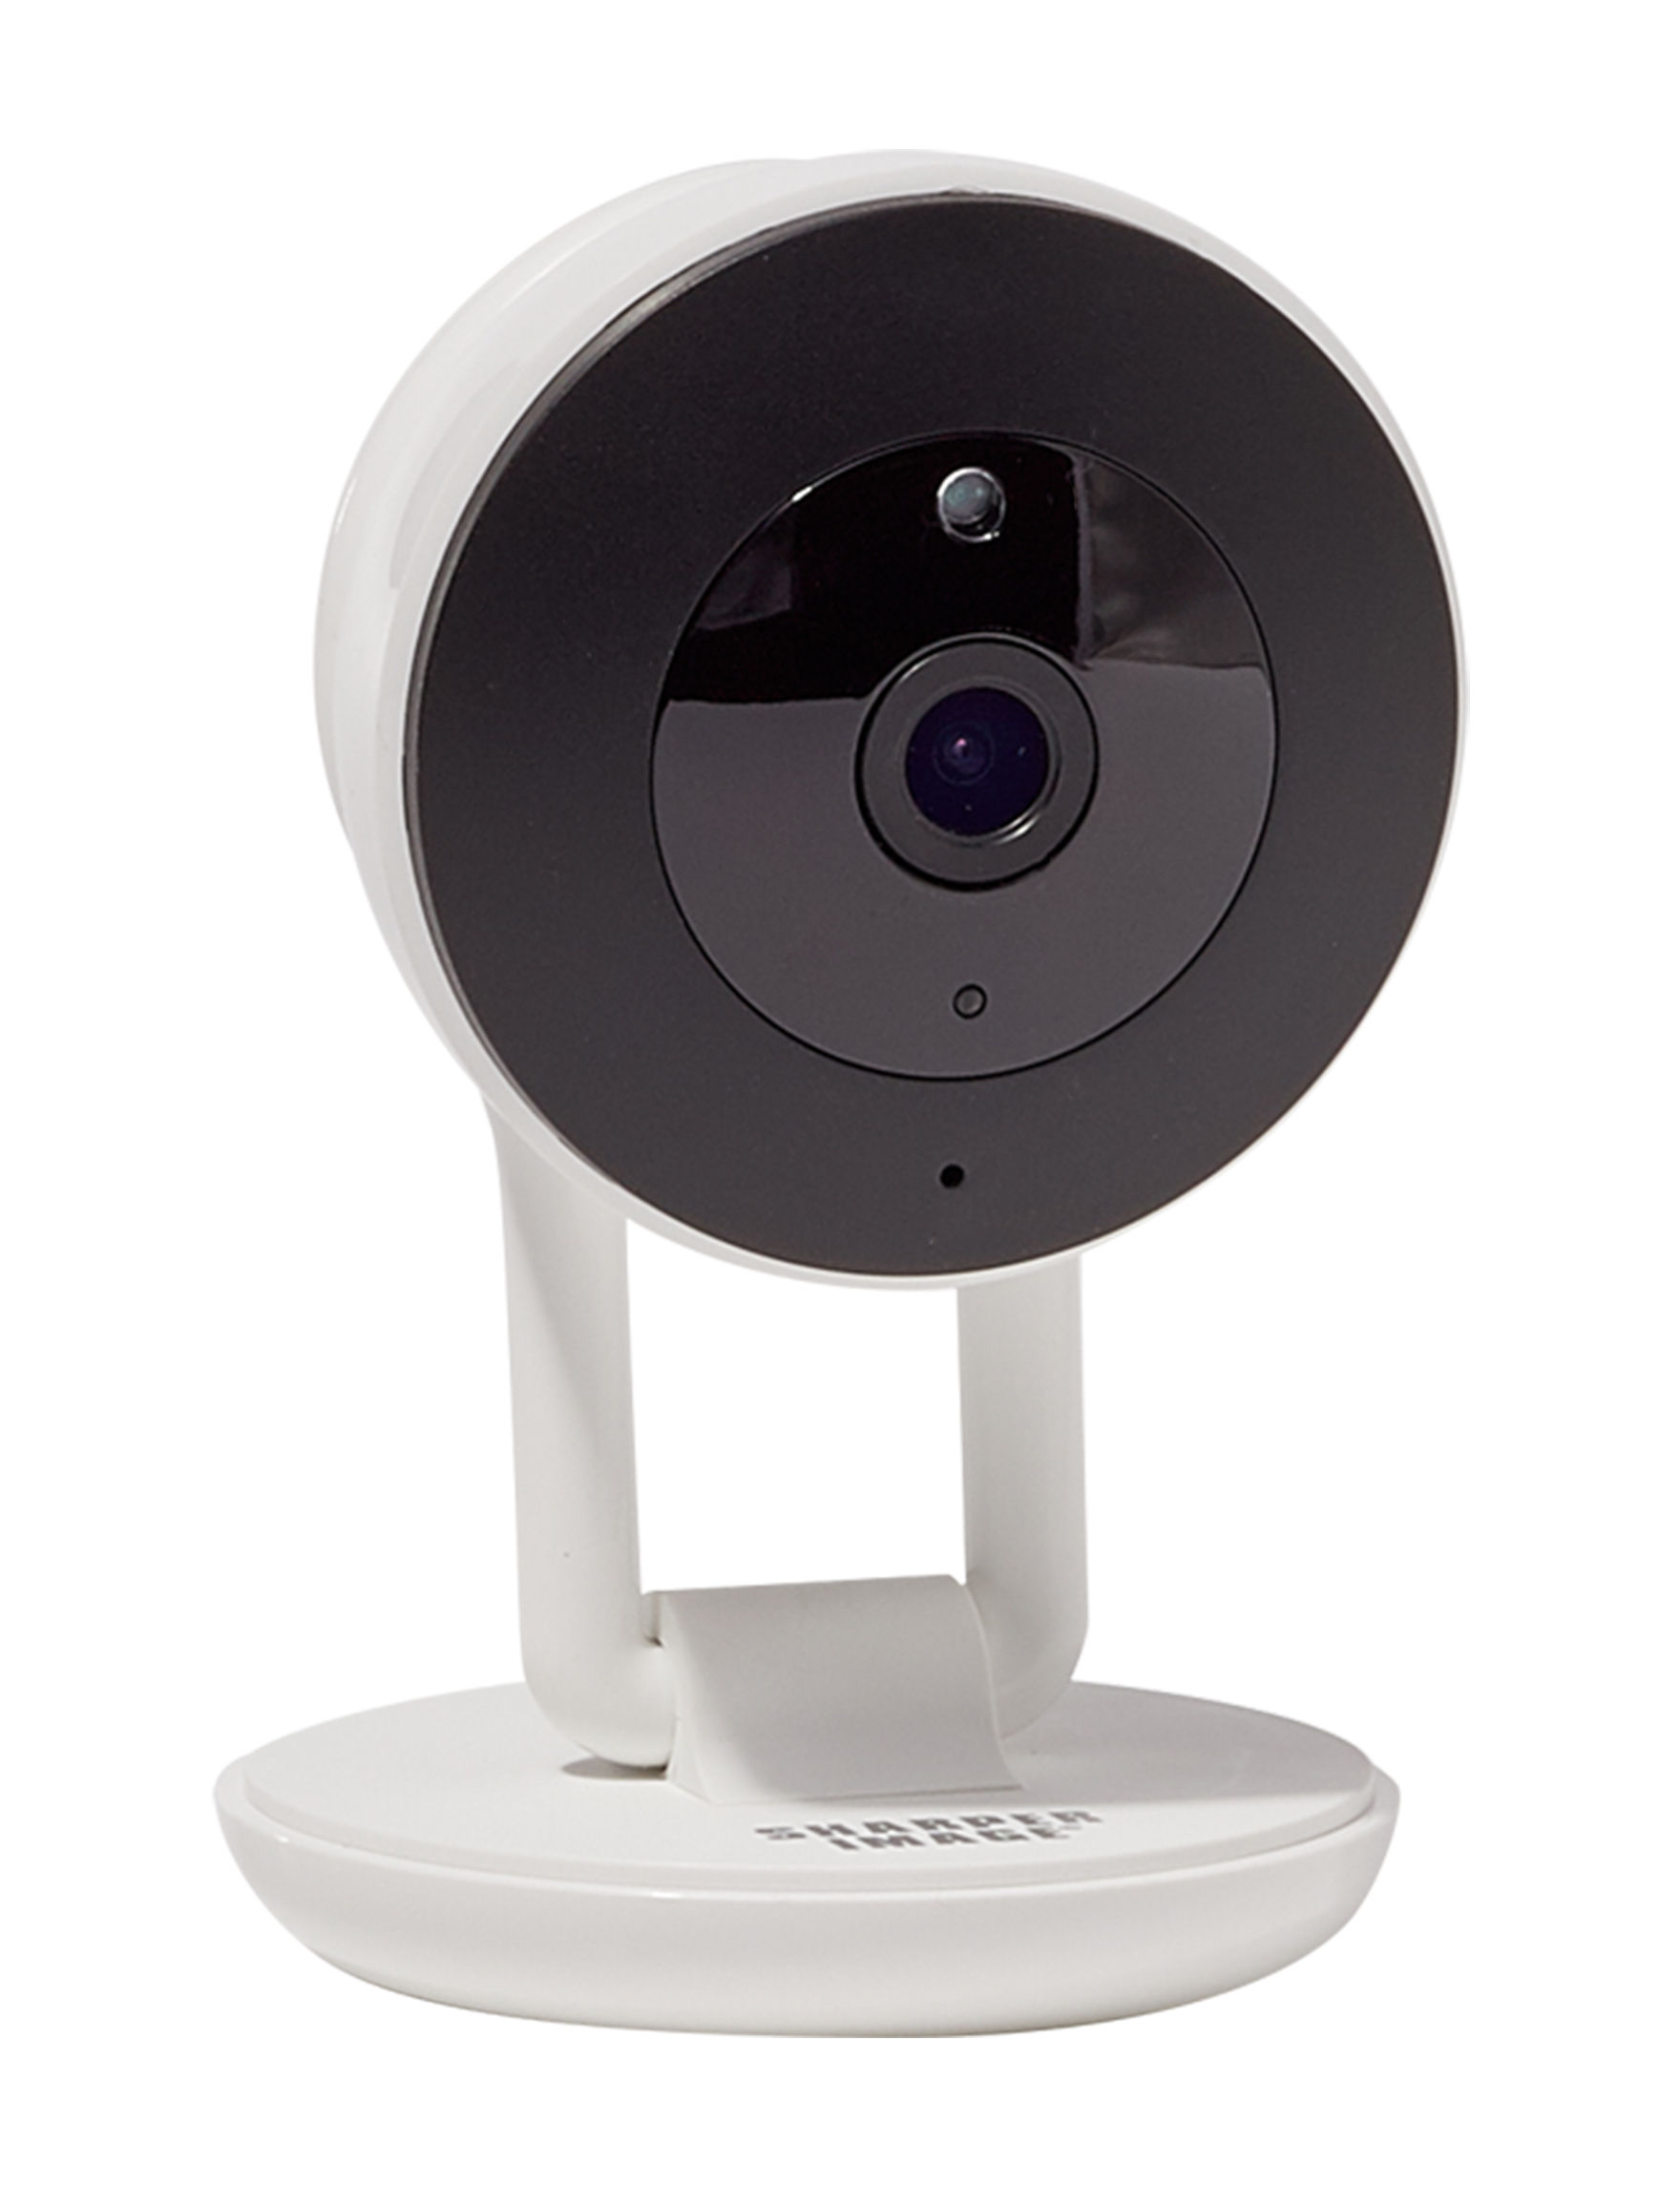 Sharper Image White Cameras & Camcorders Tech Accessories